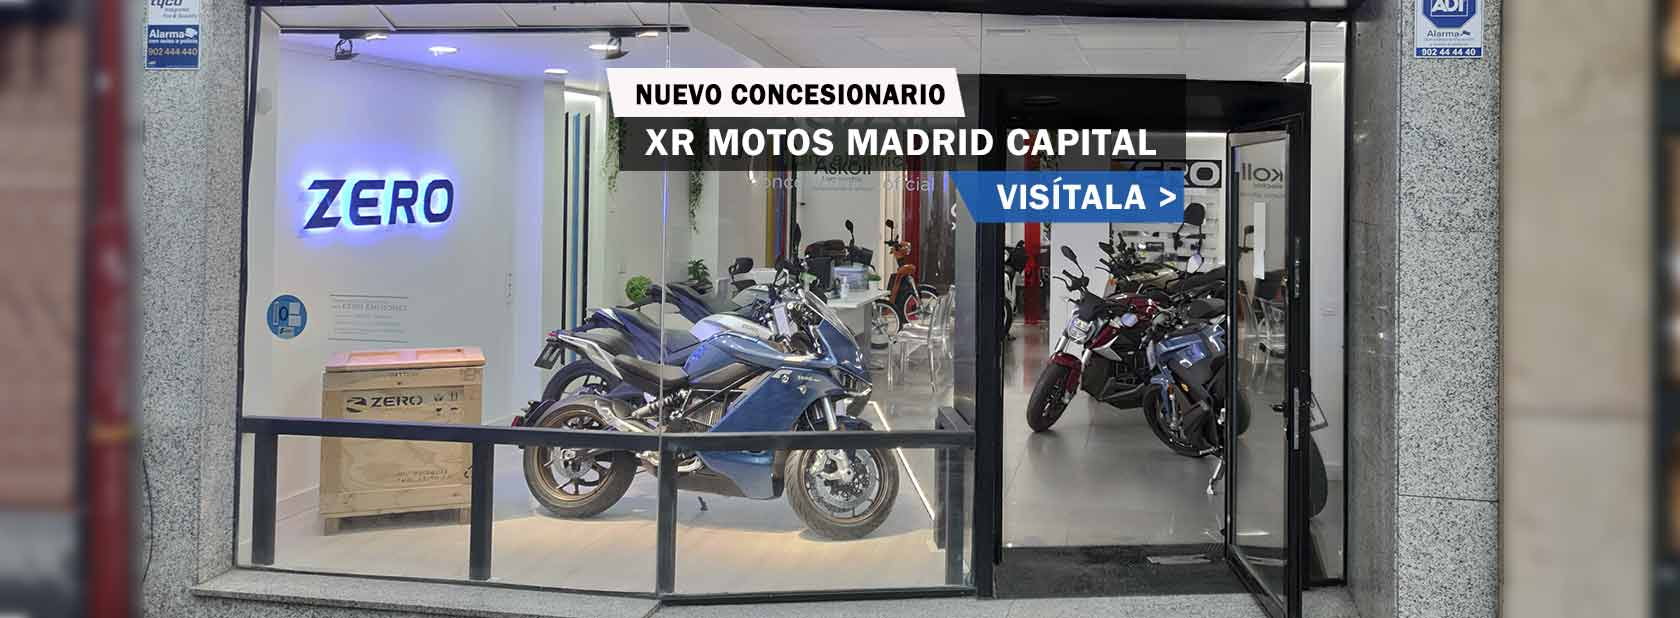 XR-Motos-Madrid-Capital-Principal